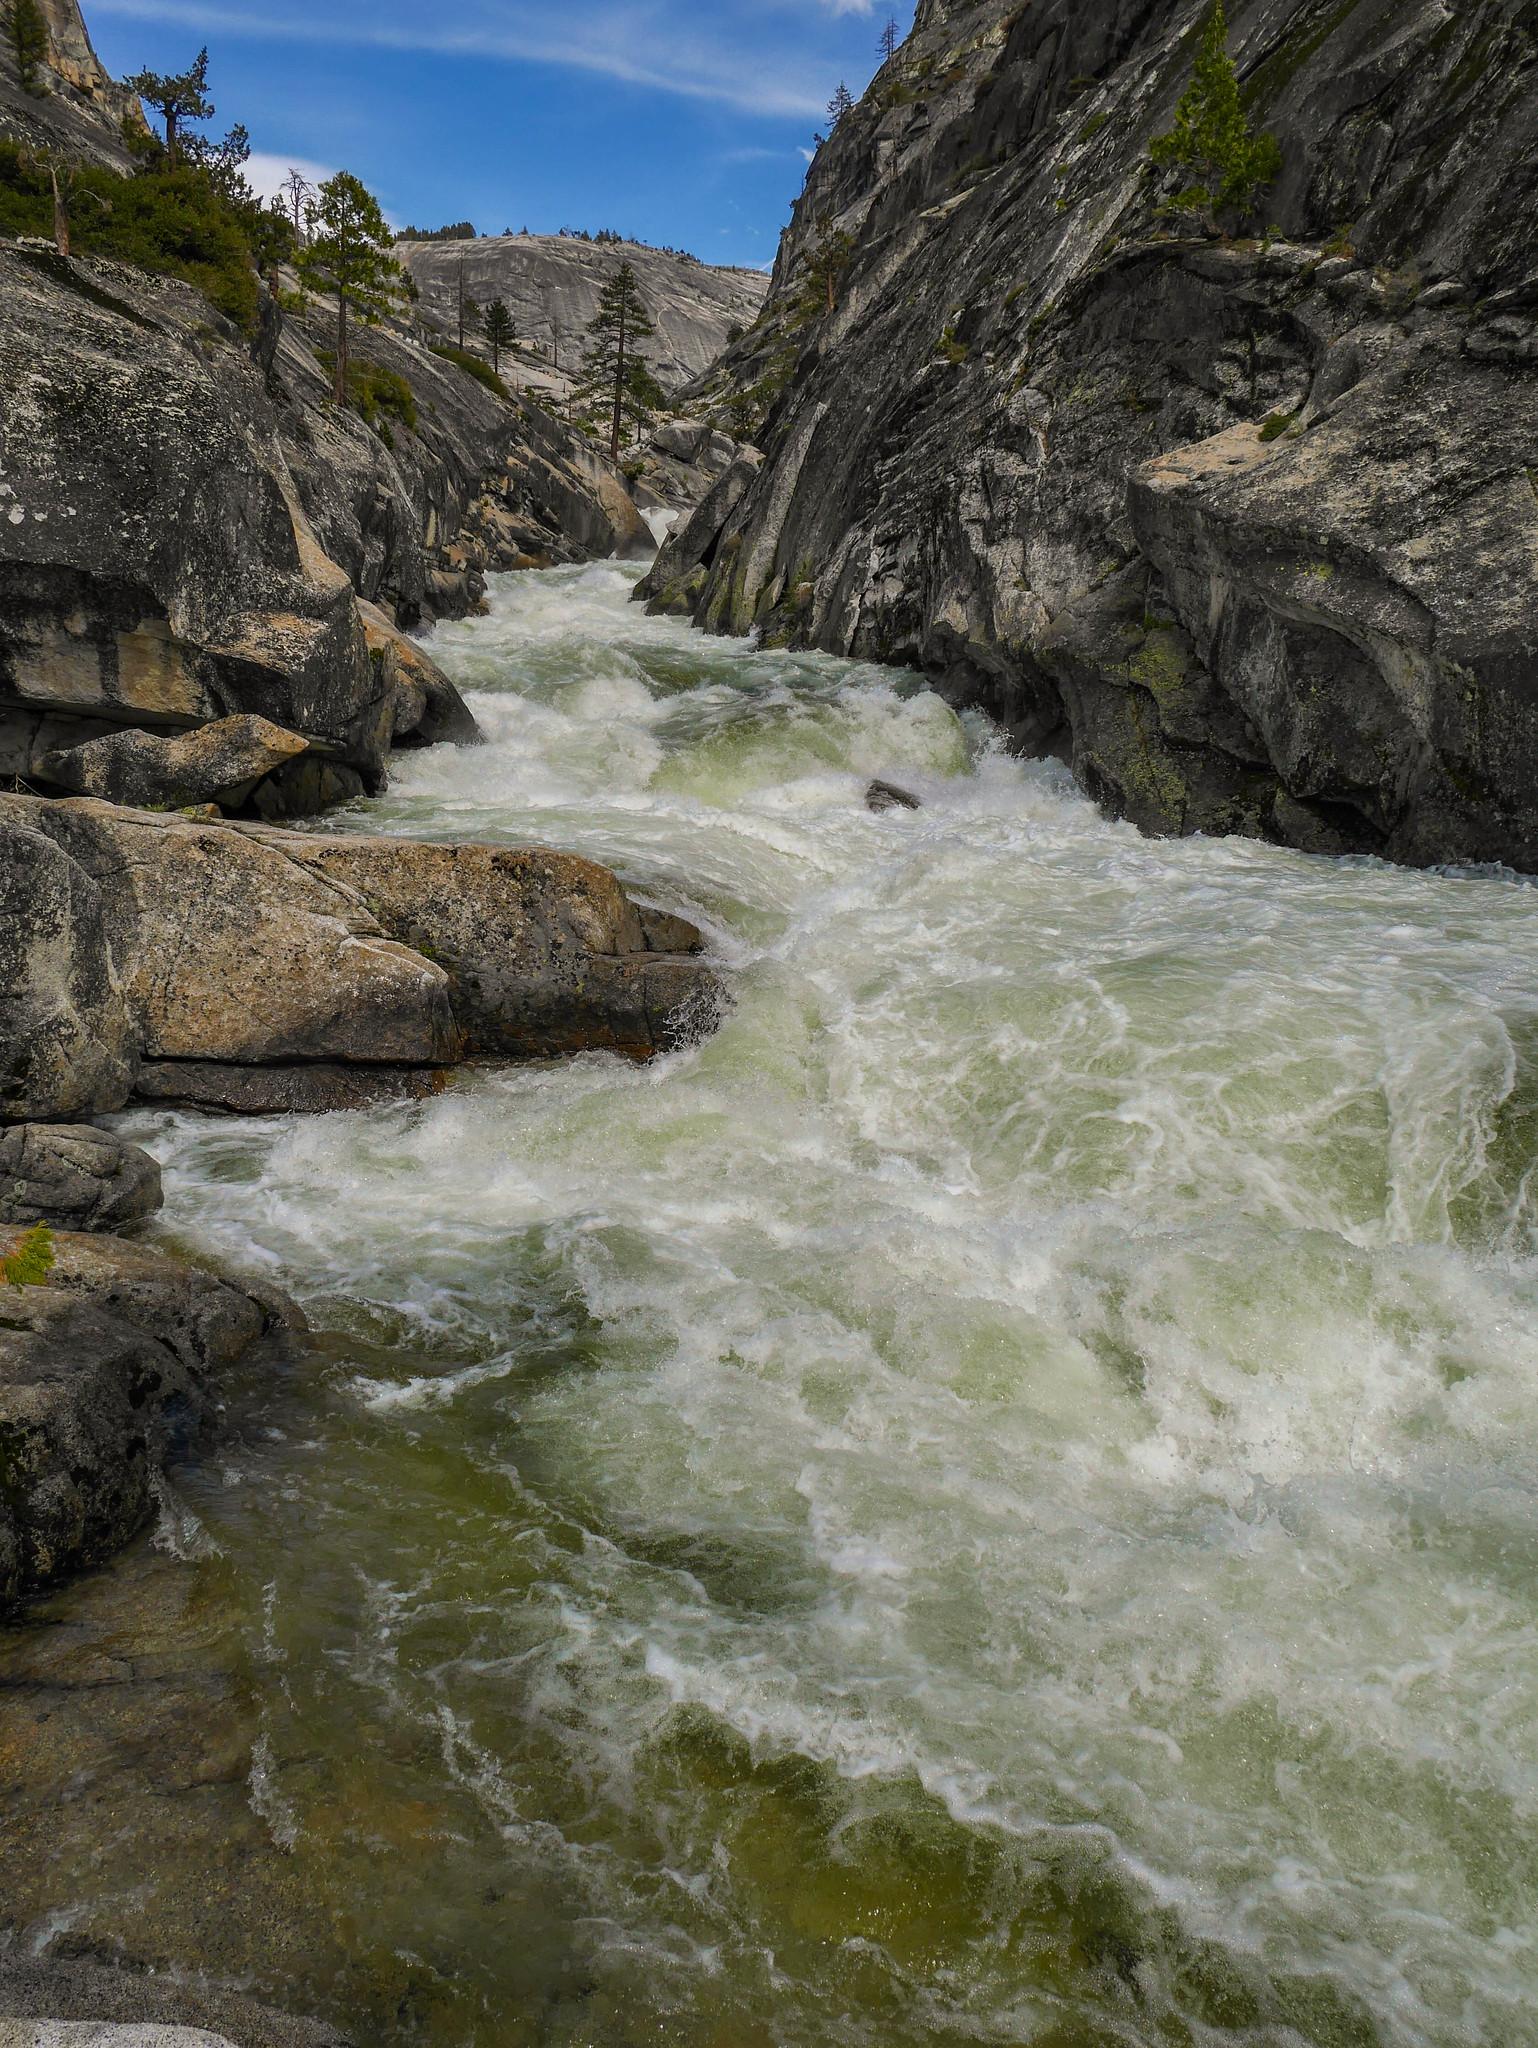 Merced River